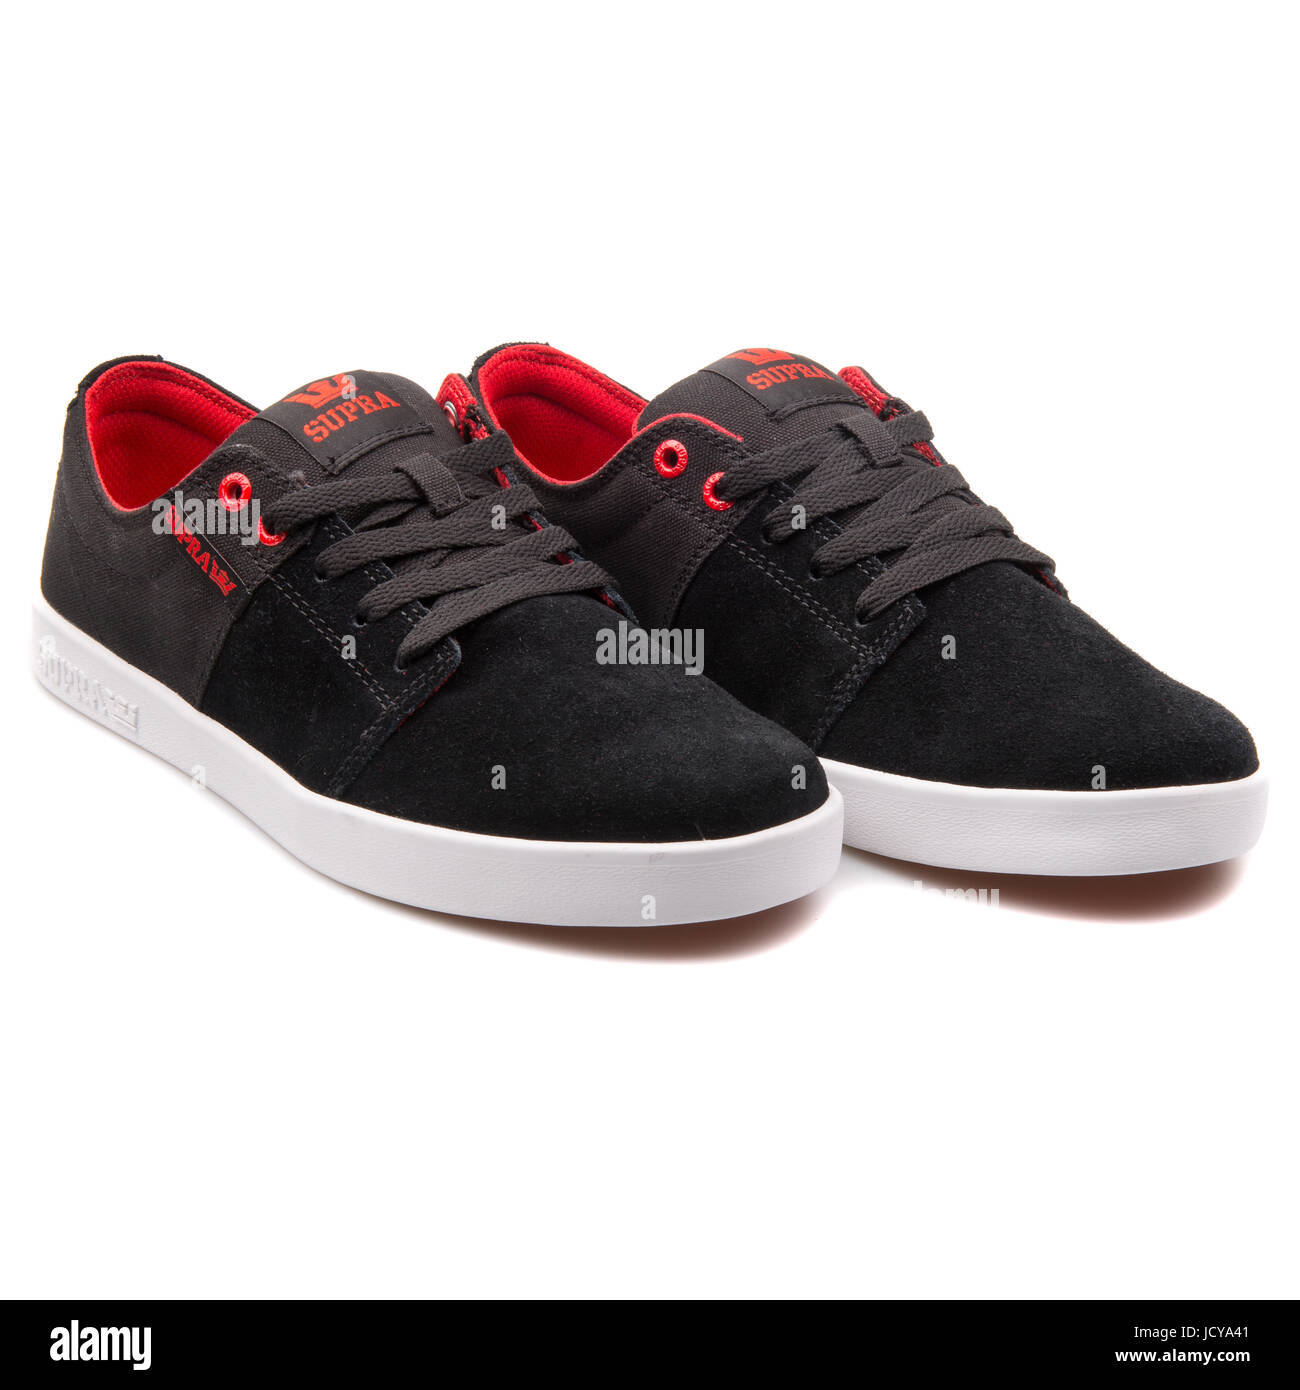 e094084572 Supra Stacks II Black, Red and White Men's Shoes - S45148 Stock ...